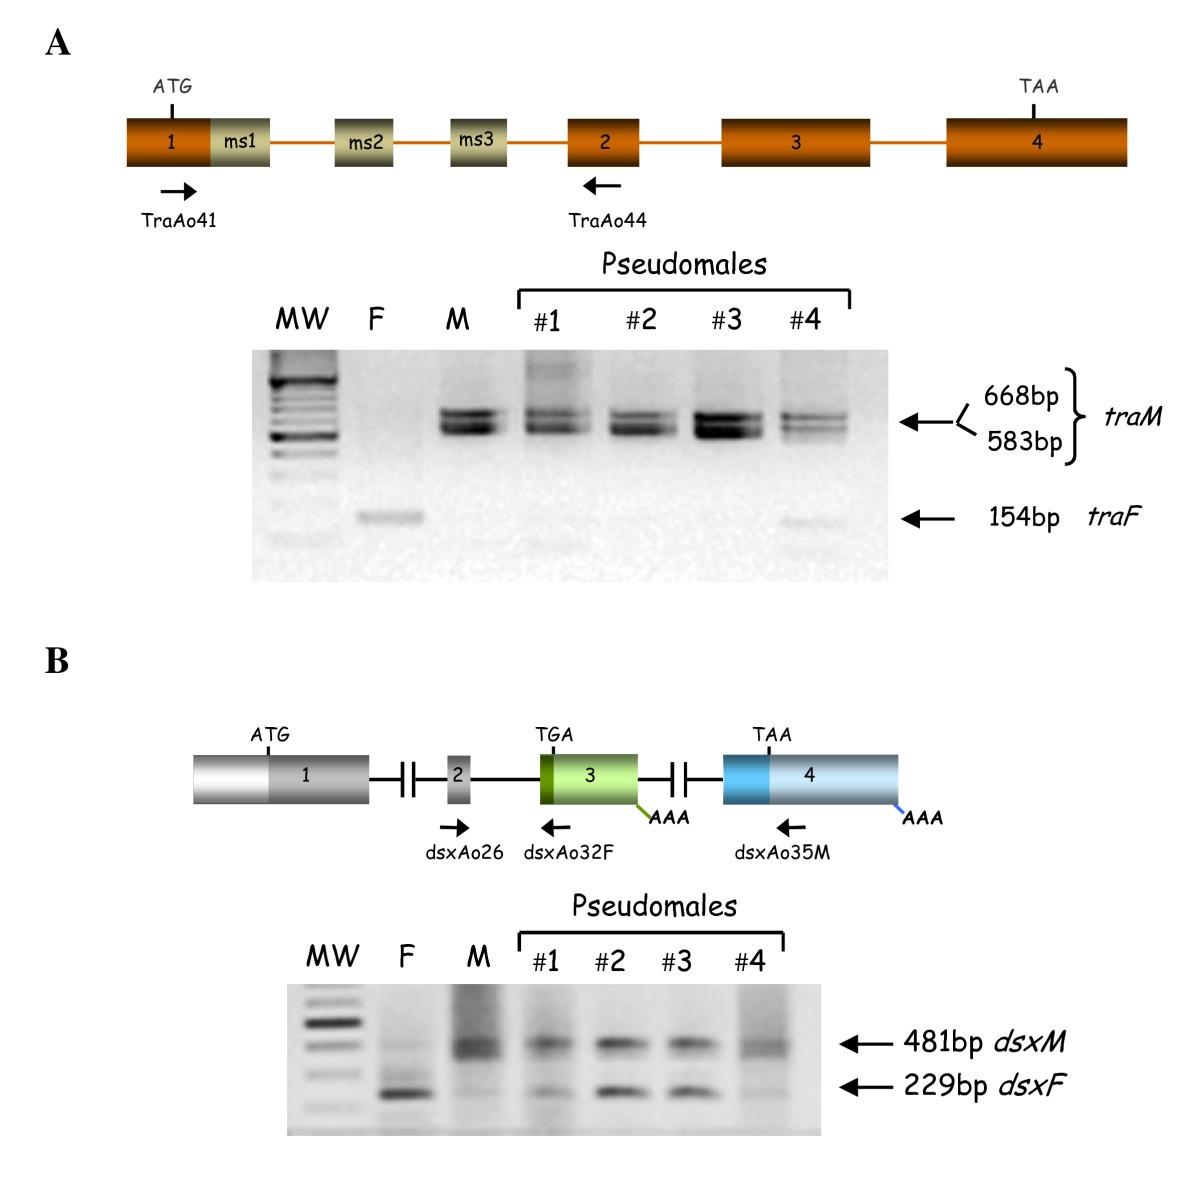 The Gene Transformer 2 Of Anastrephafruit Flies Diptera Schematic A Typical Scott T Is Shown Below Figure 4